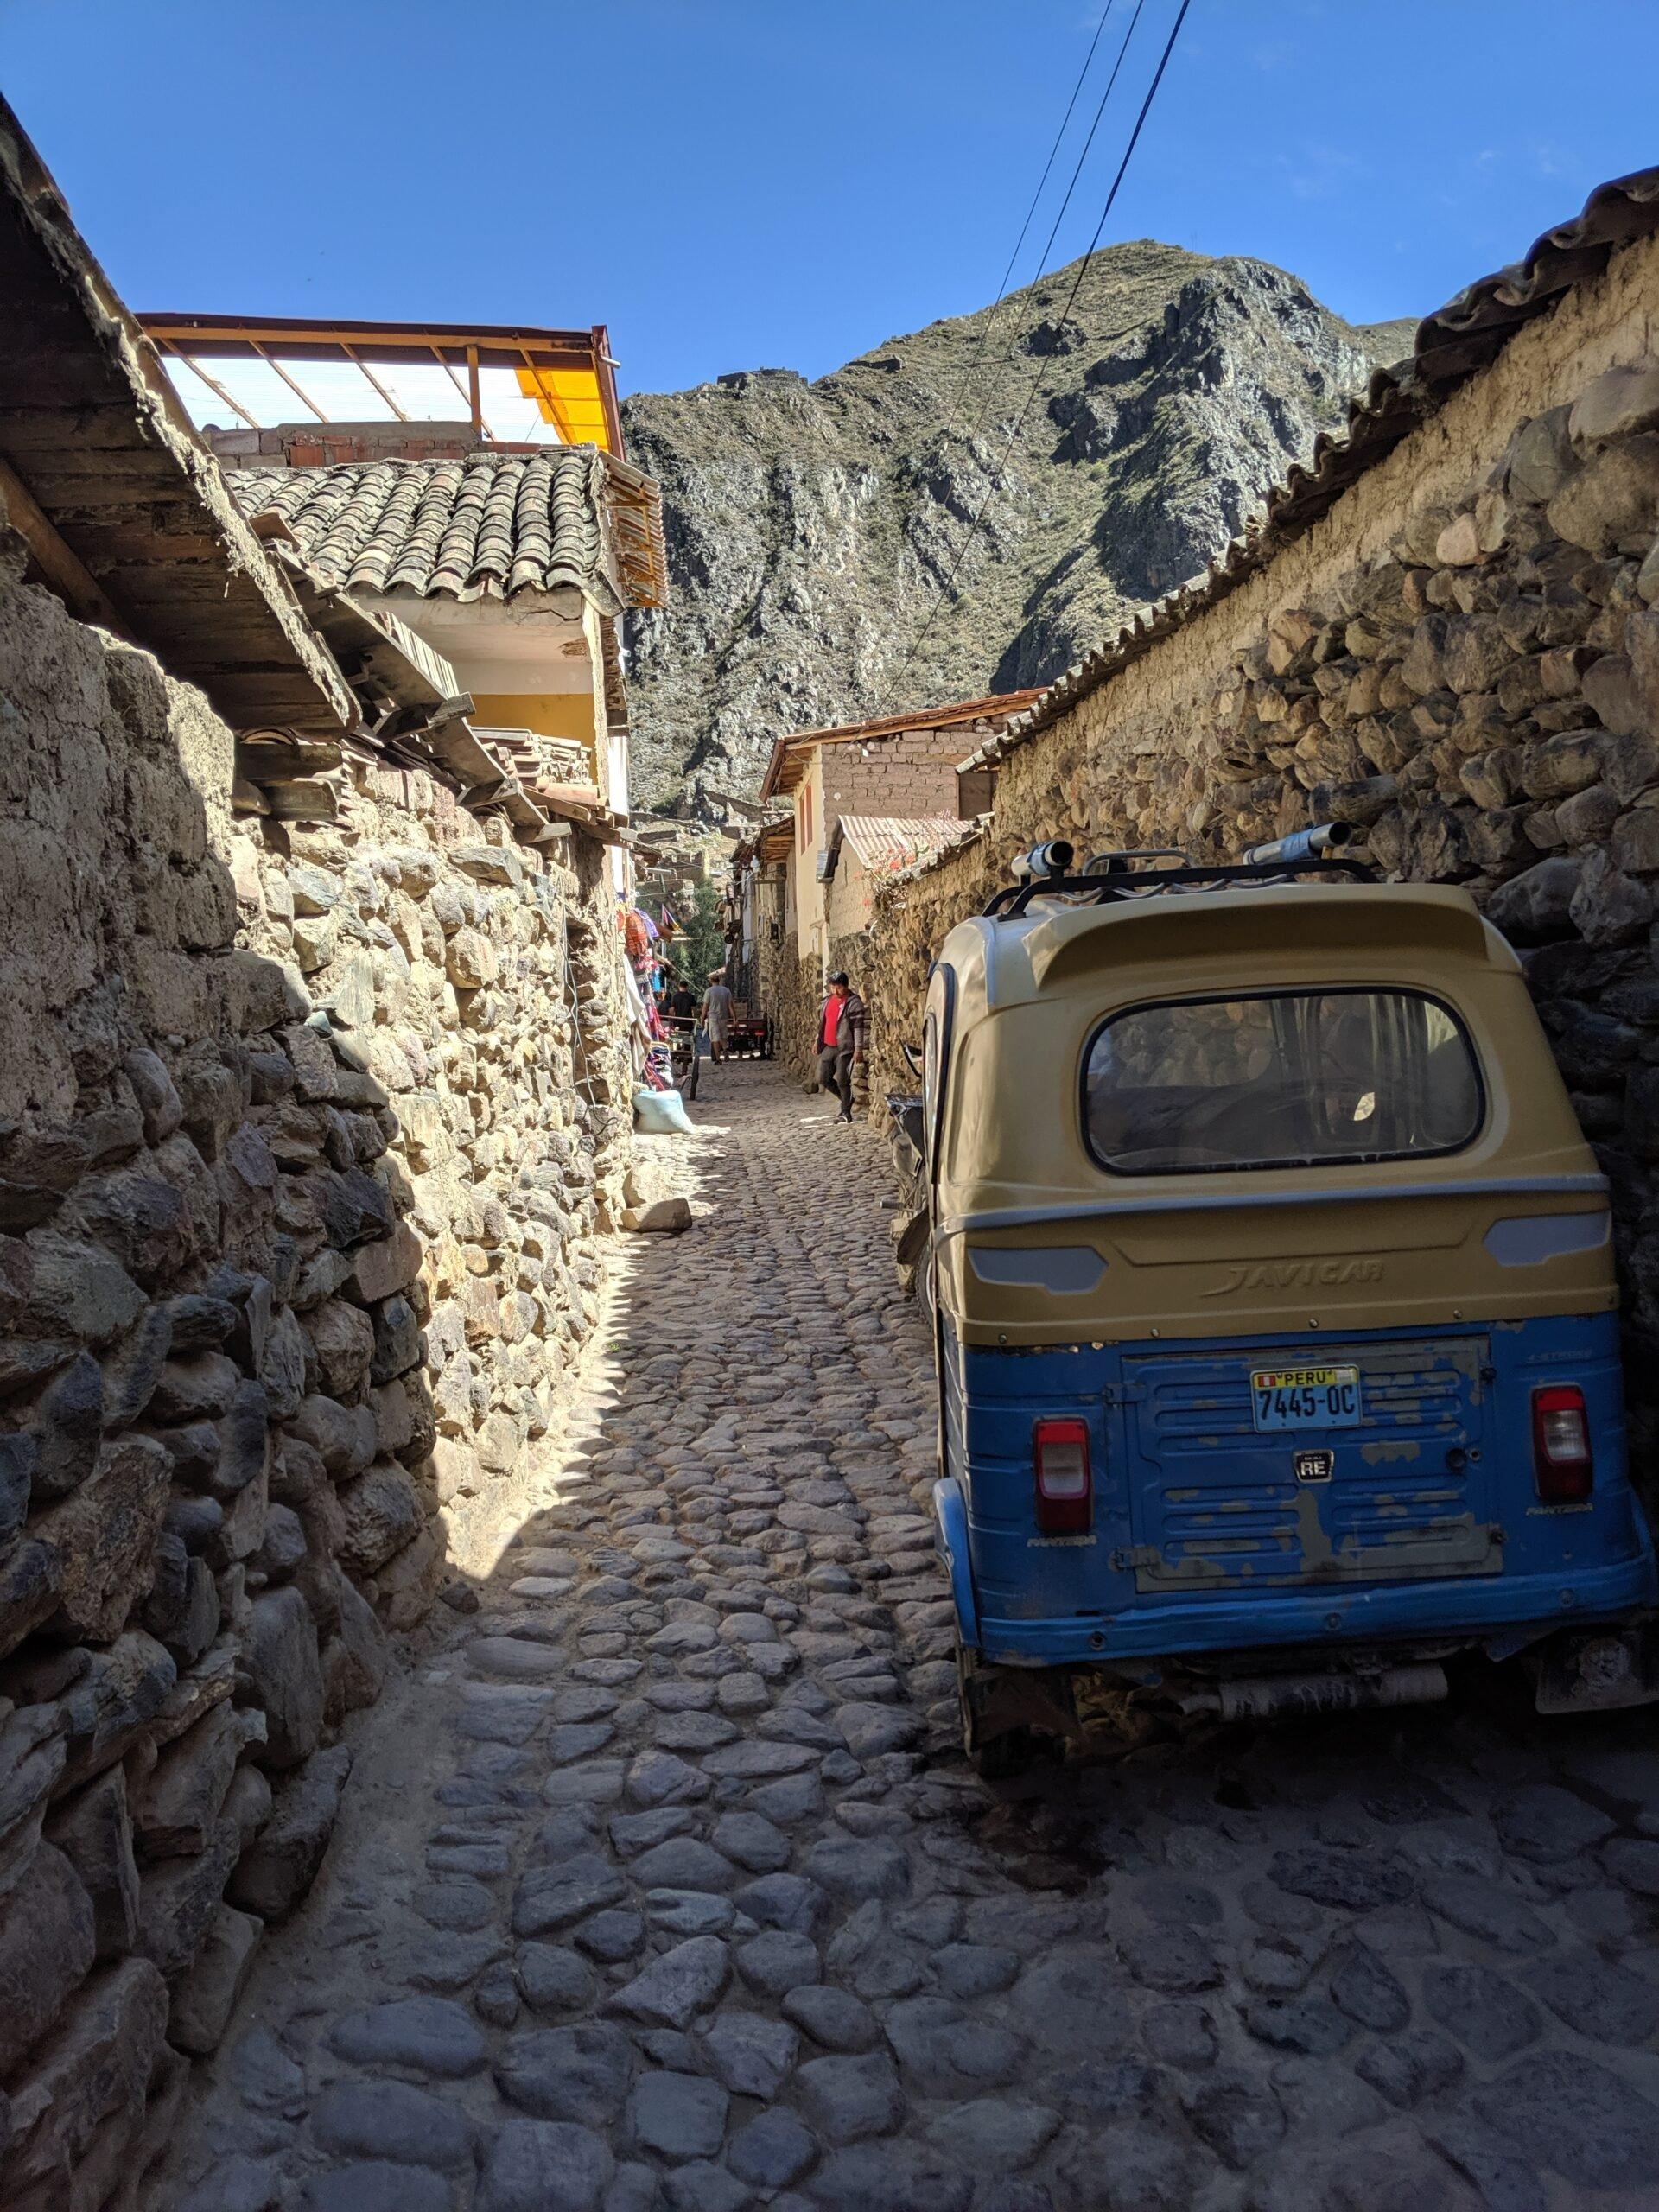 A small van sites in a narrow road in peru.